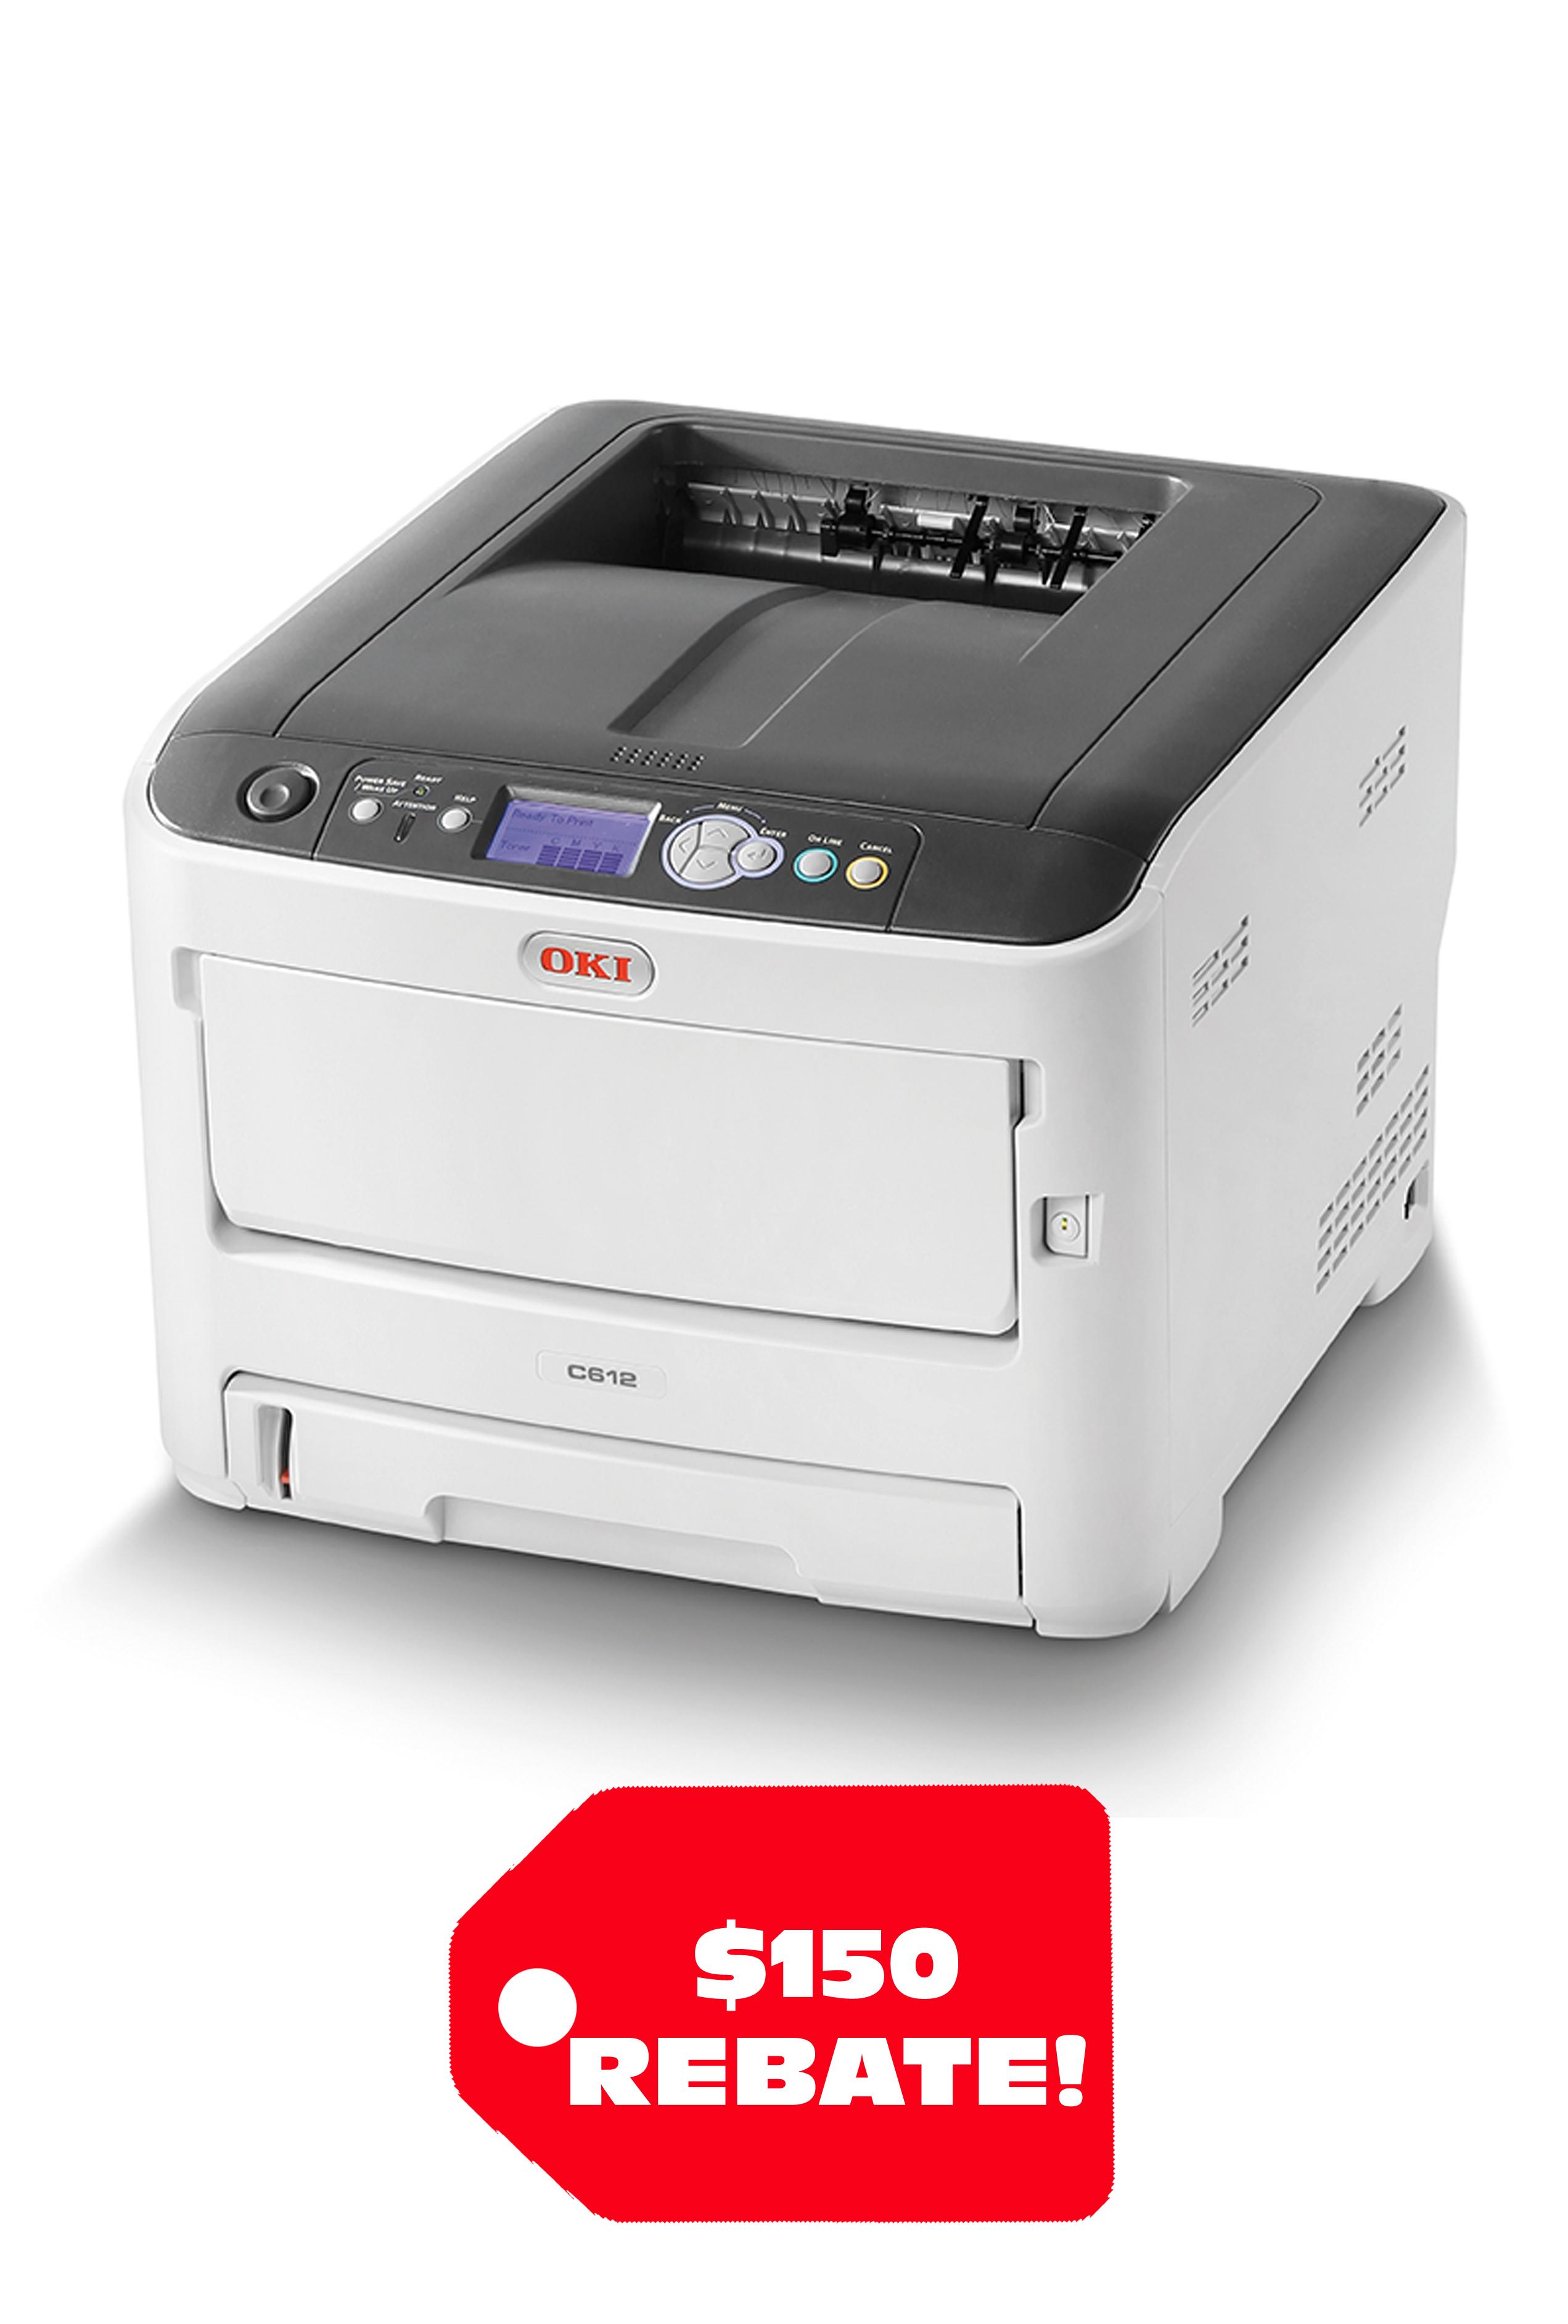 Okidata OKI C612n Digital Color Printer (33ppm)